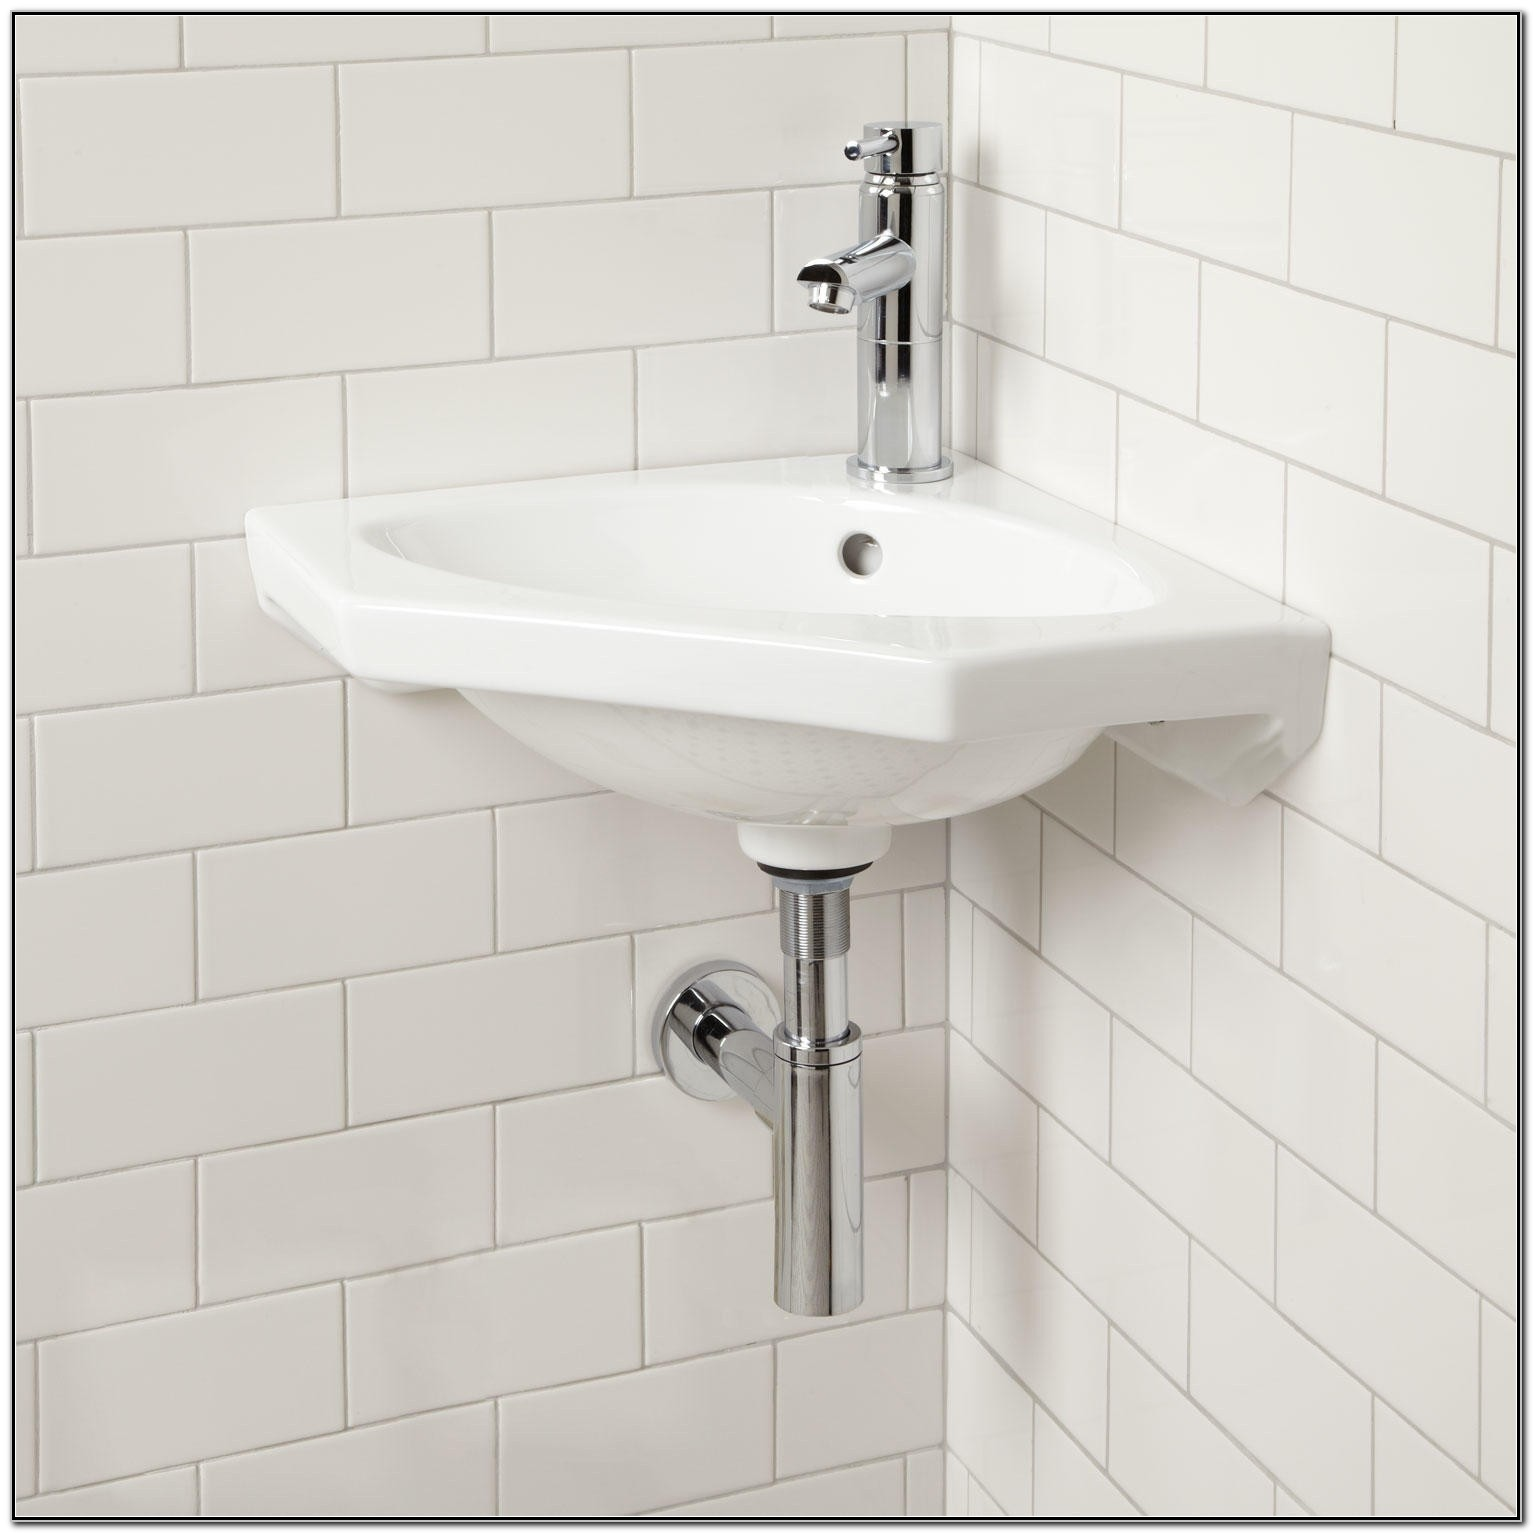 Small Wall Mounted Corner Sink